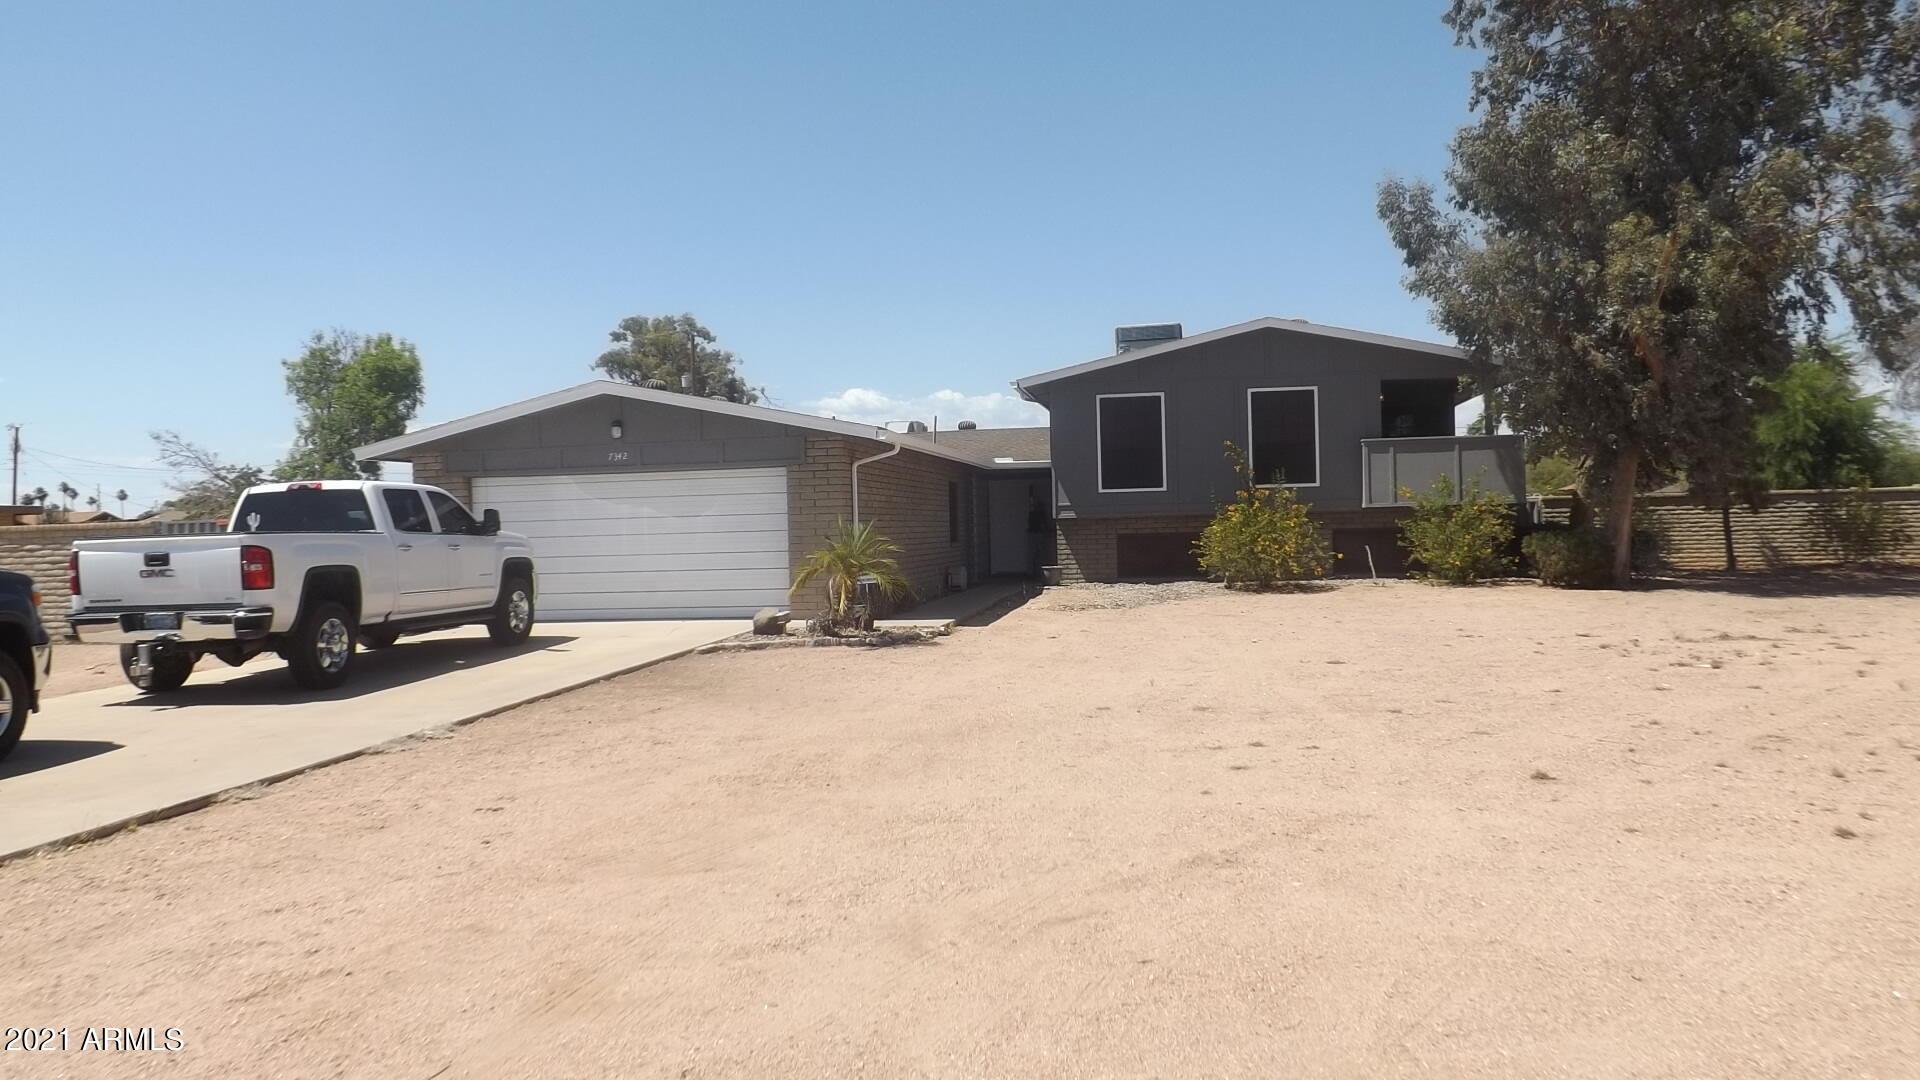 7342 BLUEFIELD Avenue, Glendale, Arizona 85308, 4 Bedrooms Bedrooms, ,2.5 BathroomsBathrooms,Residential,For Sale,BLUEFIELD,6244976